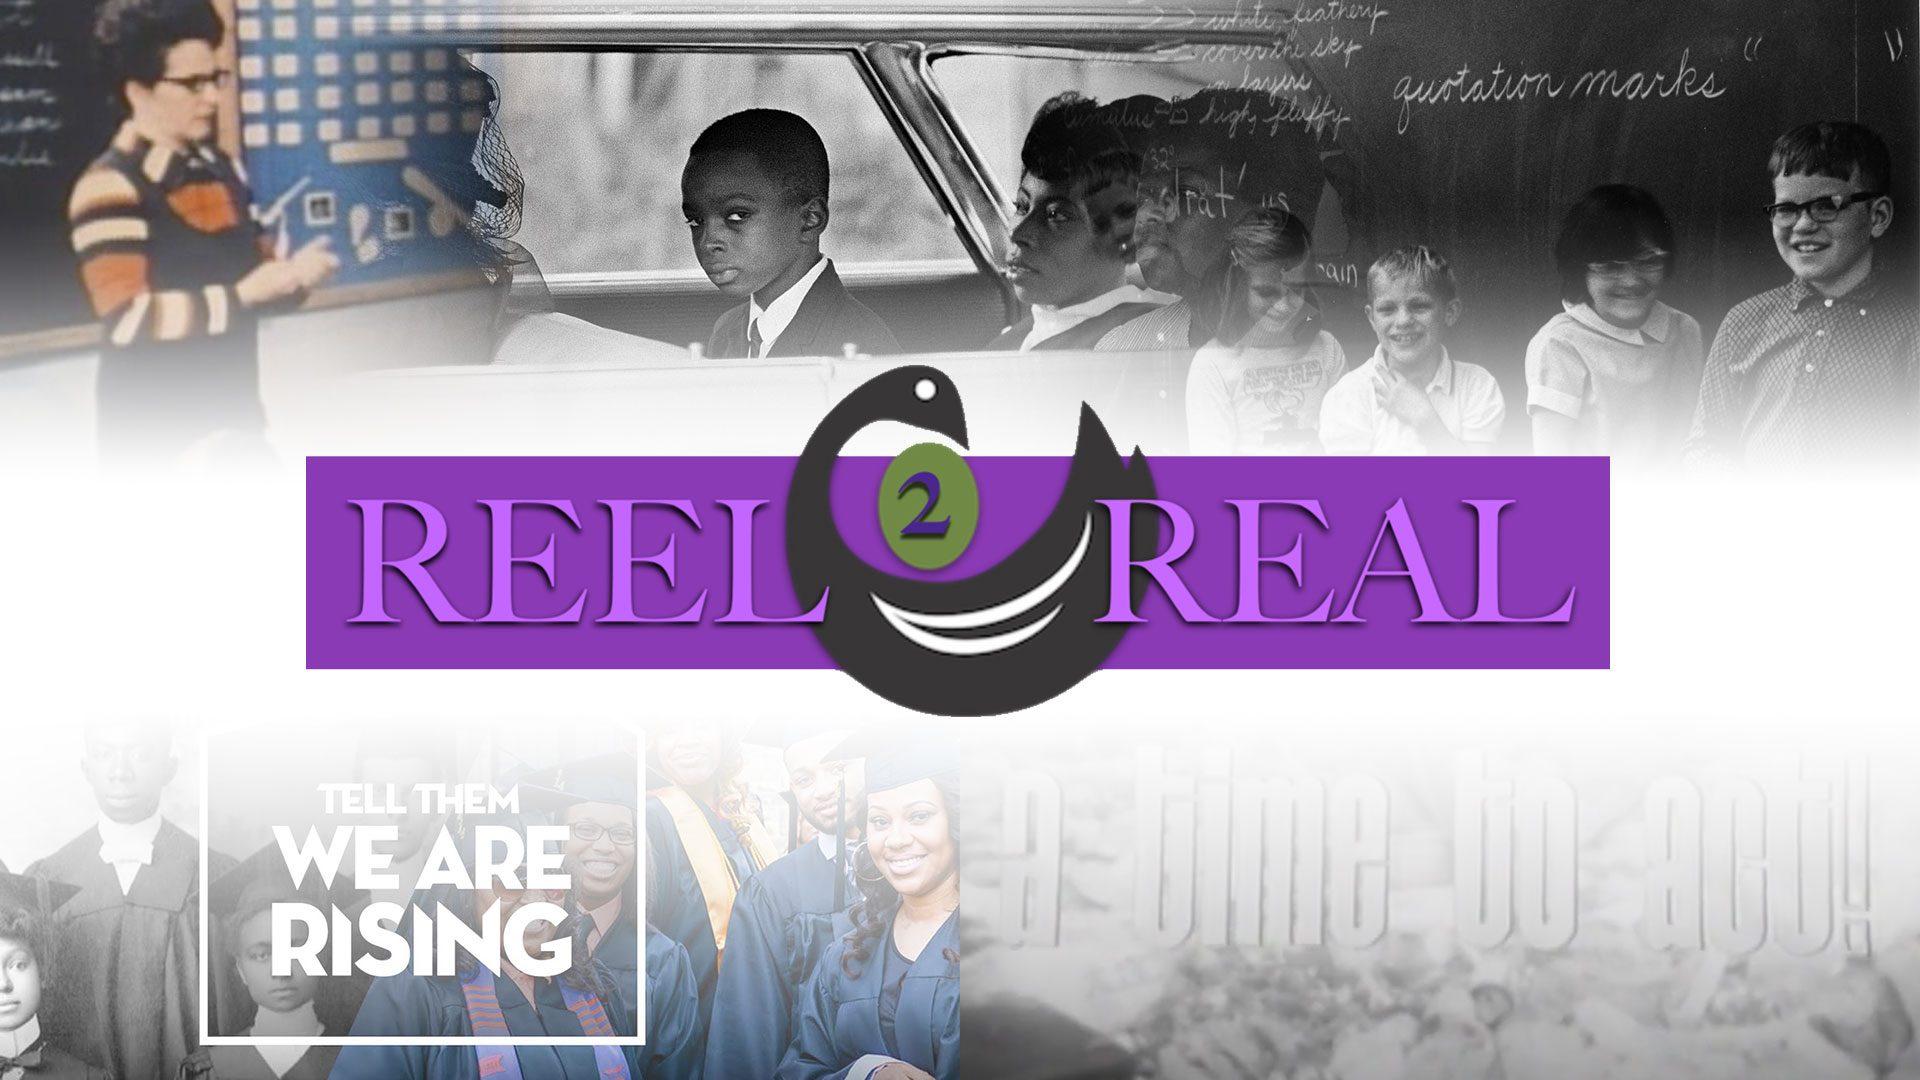 Sankofa REEL2REAL film festival title card